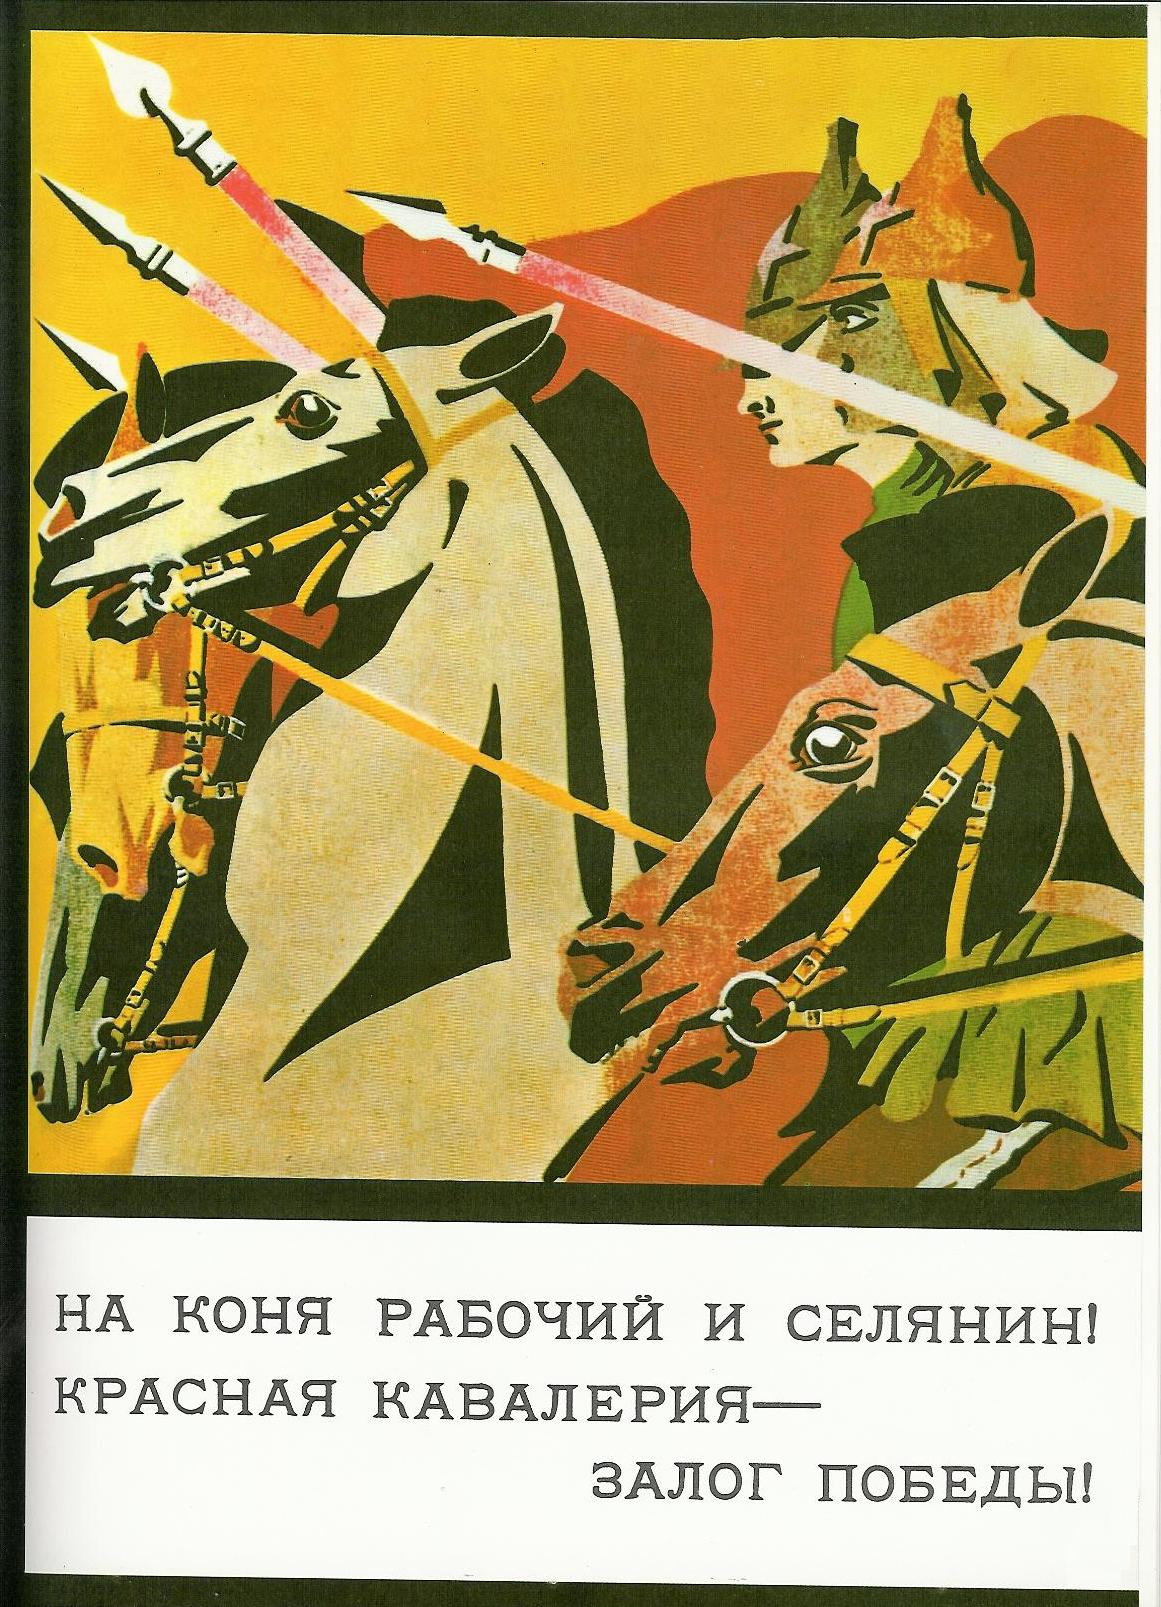 1919 фронт в июне 1920 фронт в августе 1920